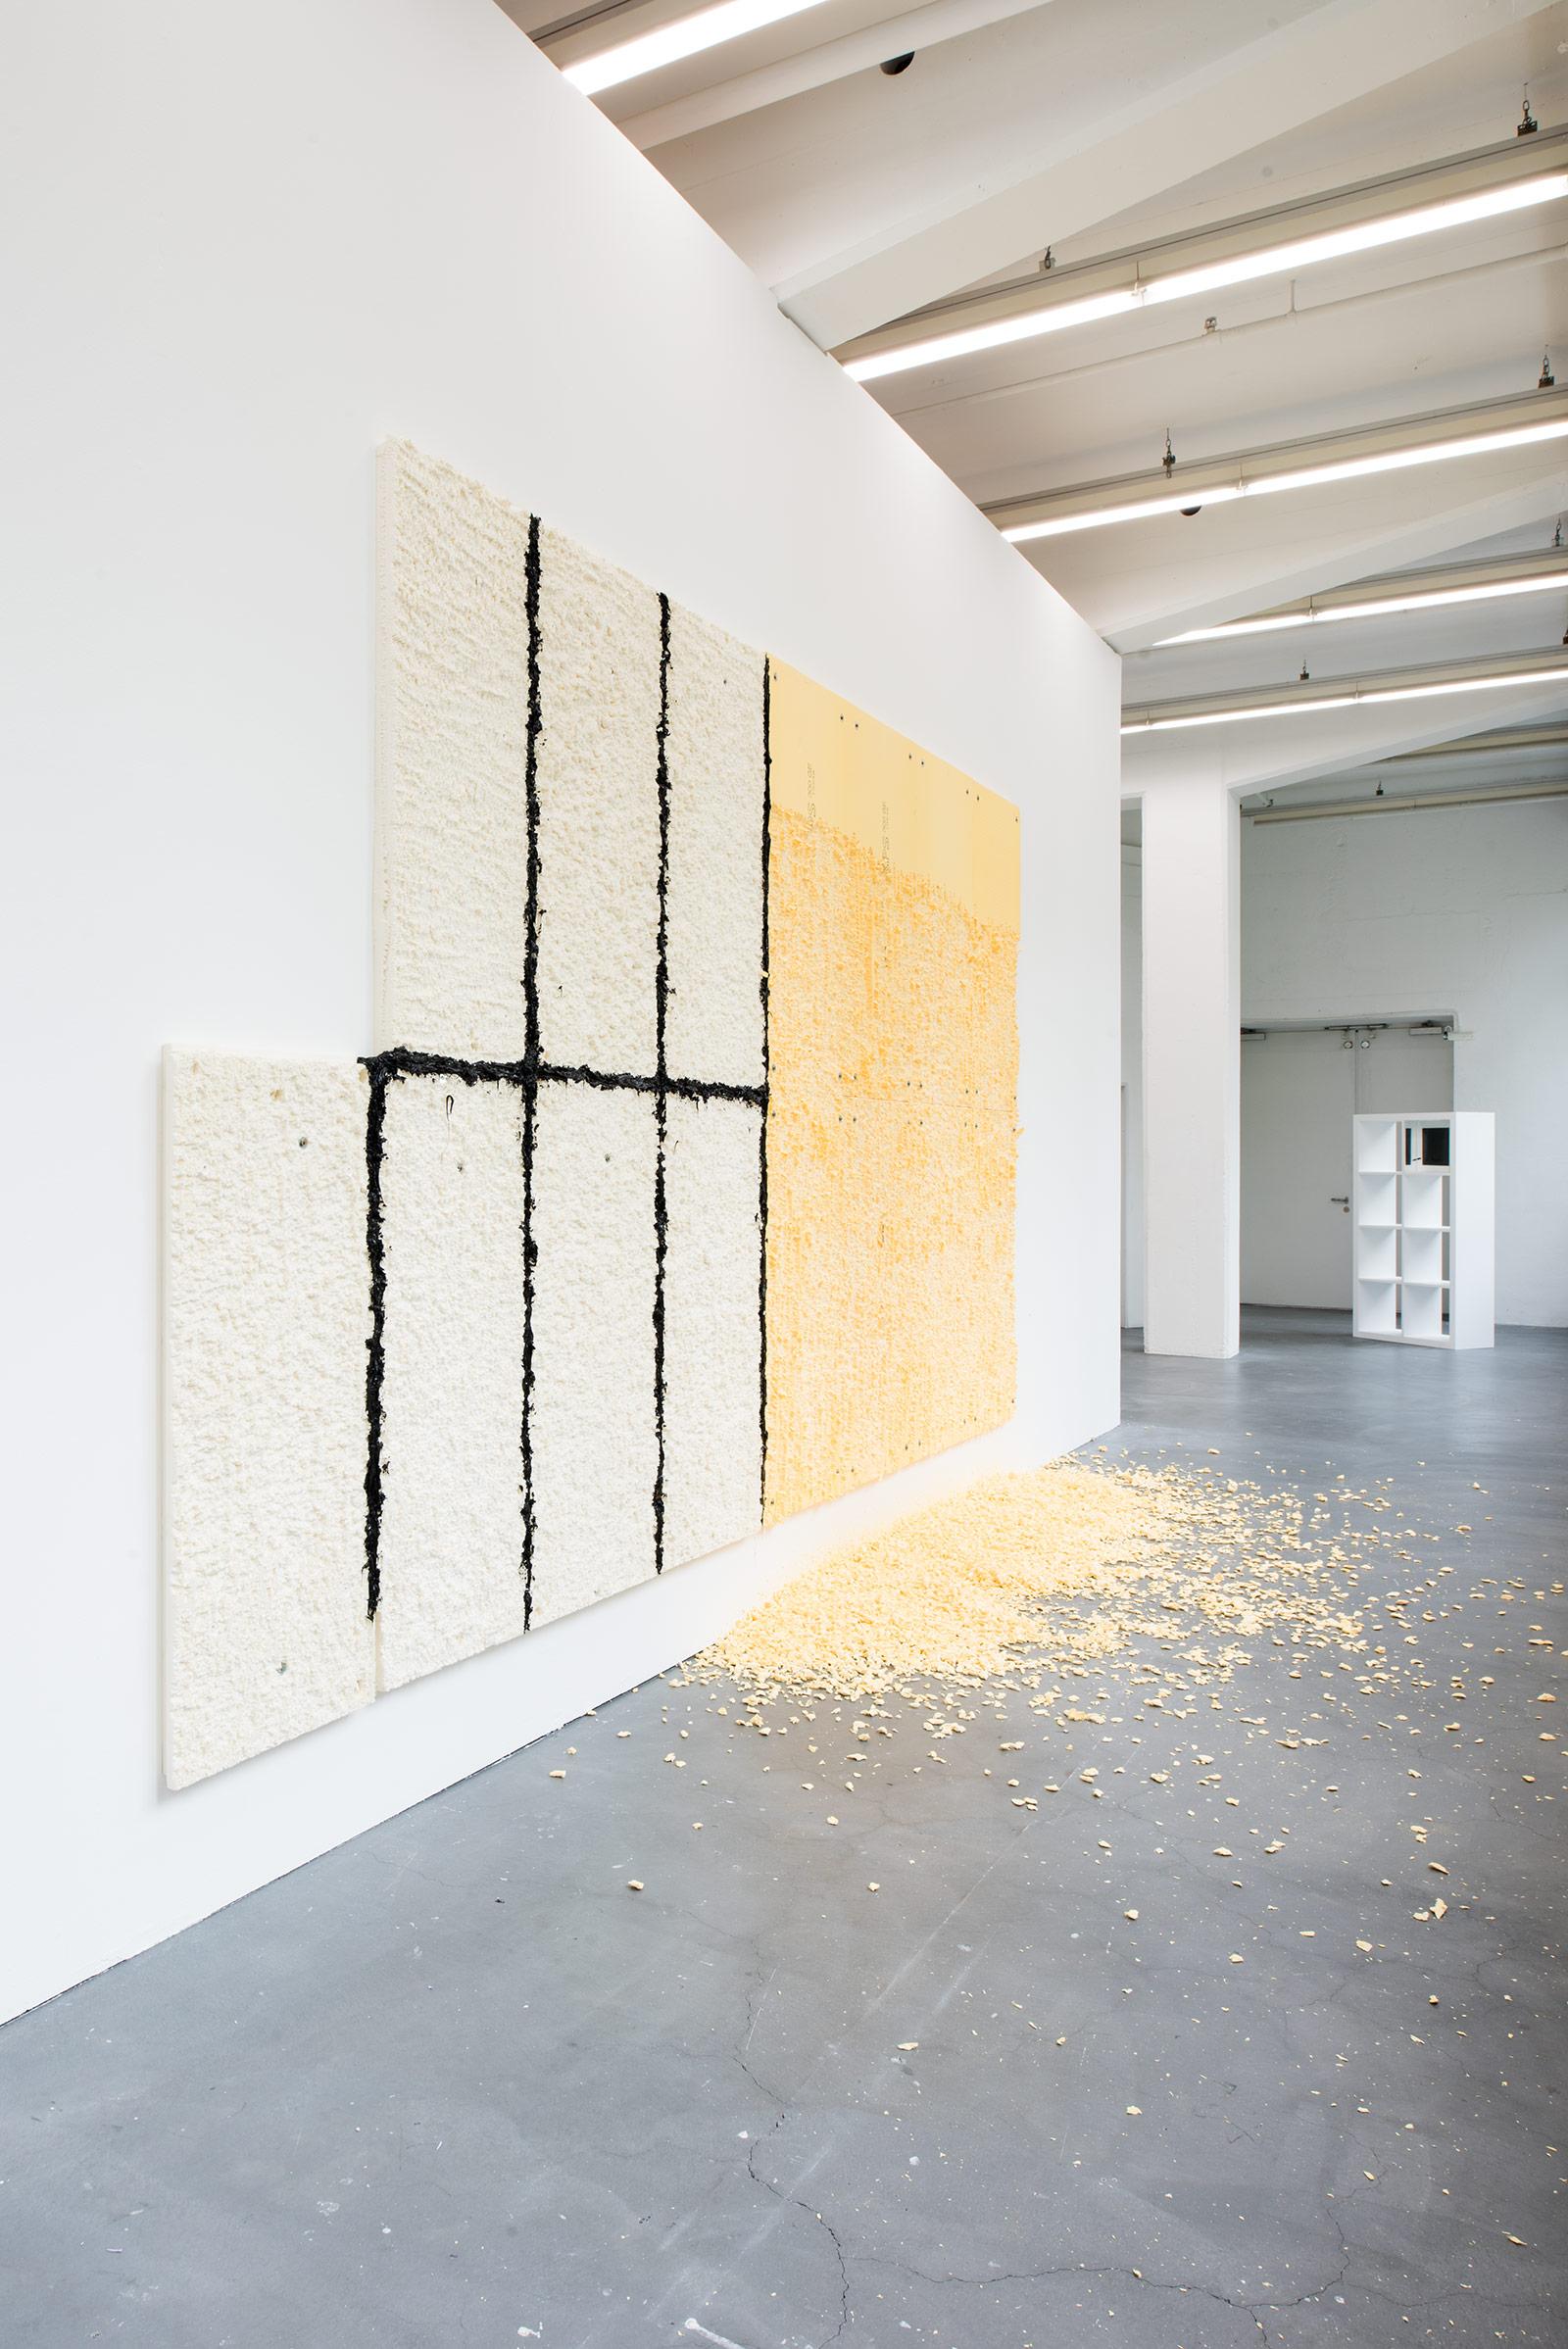 Florian Thate – Institut Kunst, Diplom 2017